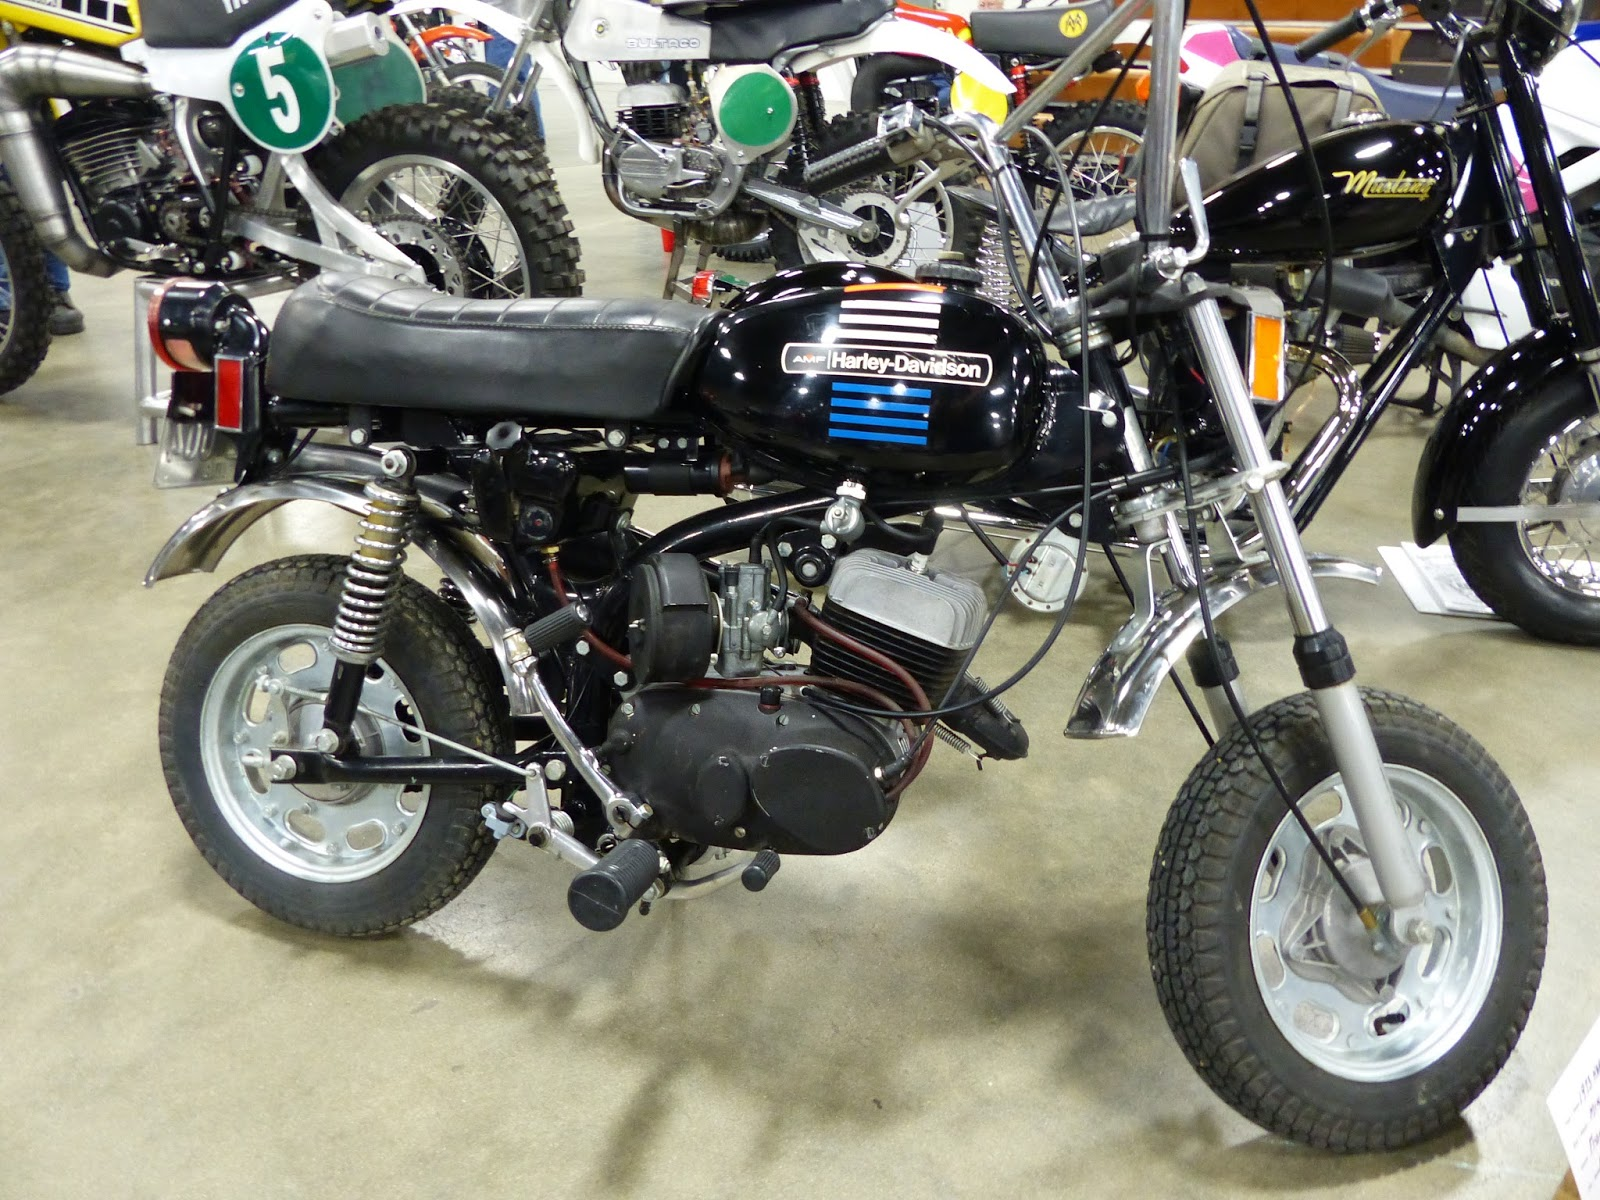 oldmotodude 1973 harley davidson aermacchi 90cc mini bike. Black Bedroom Furniture Sets. Home Design Ideas